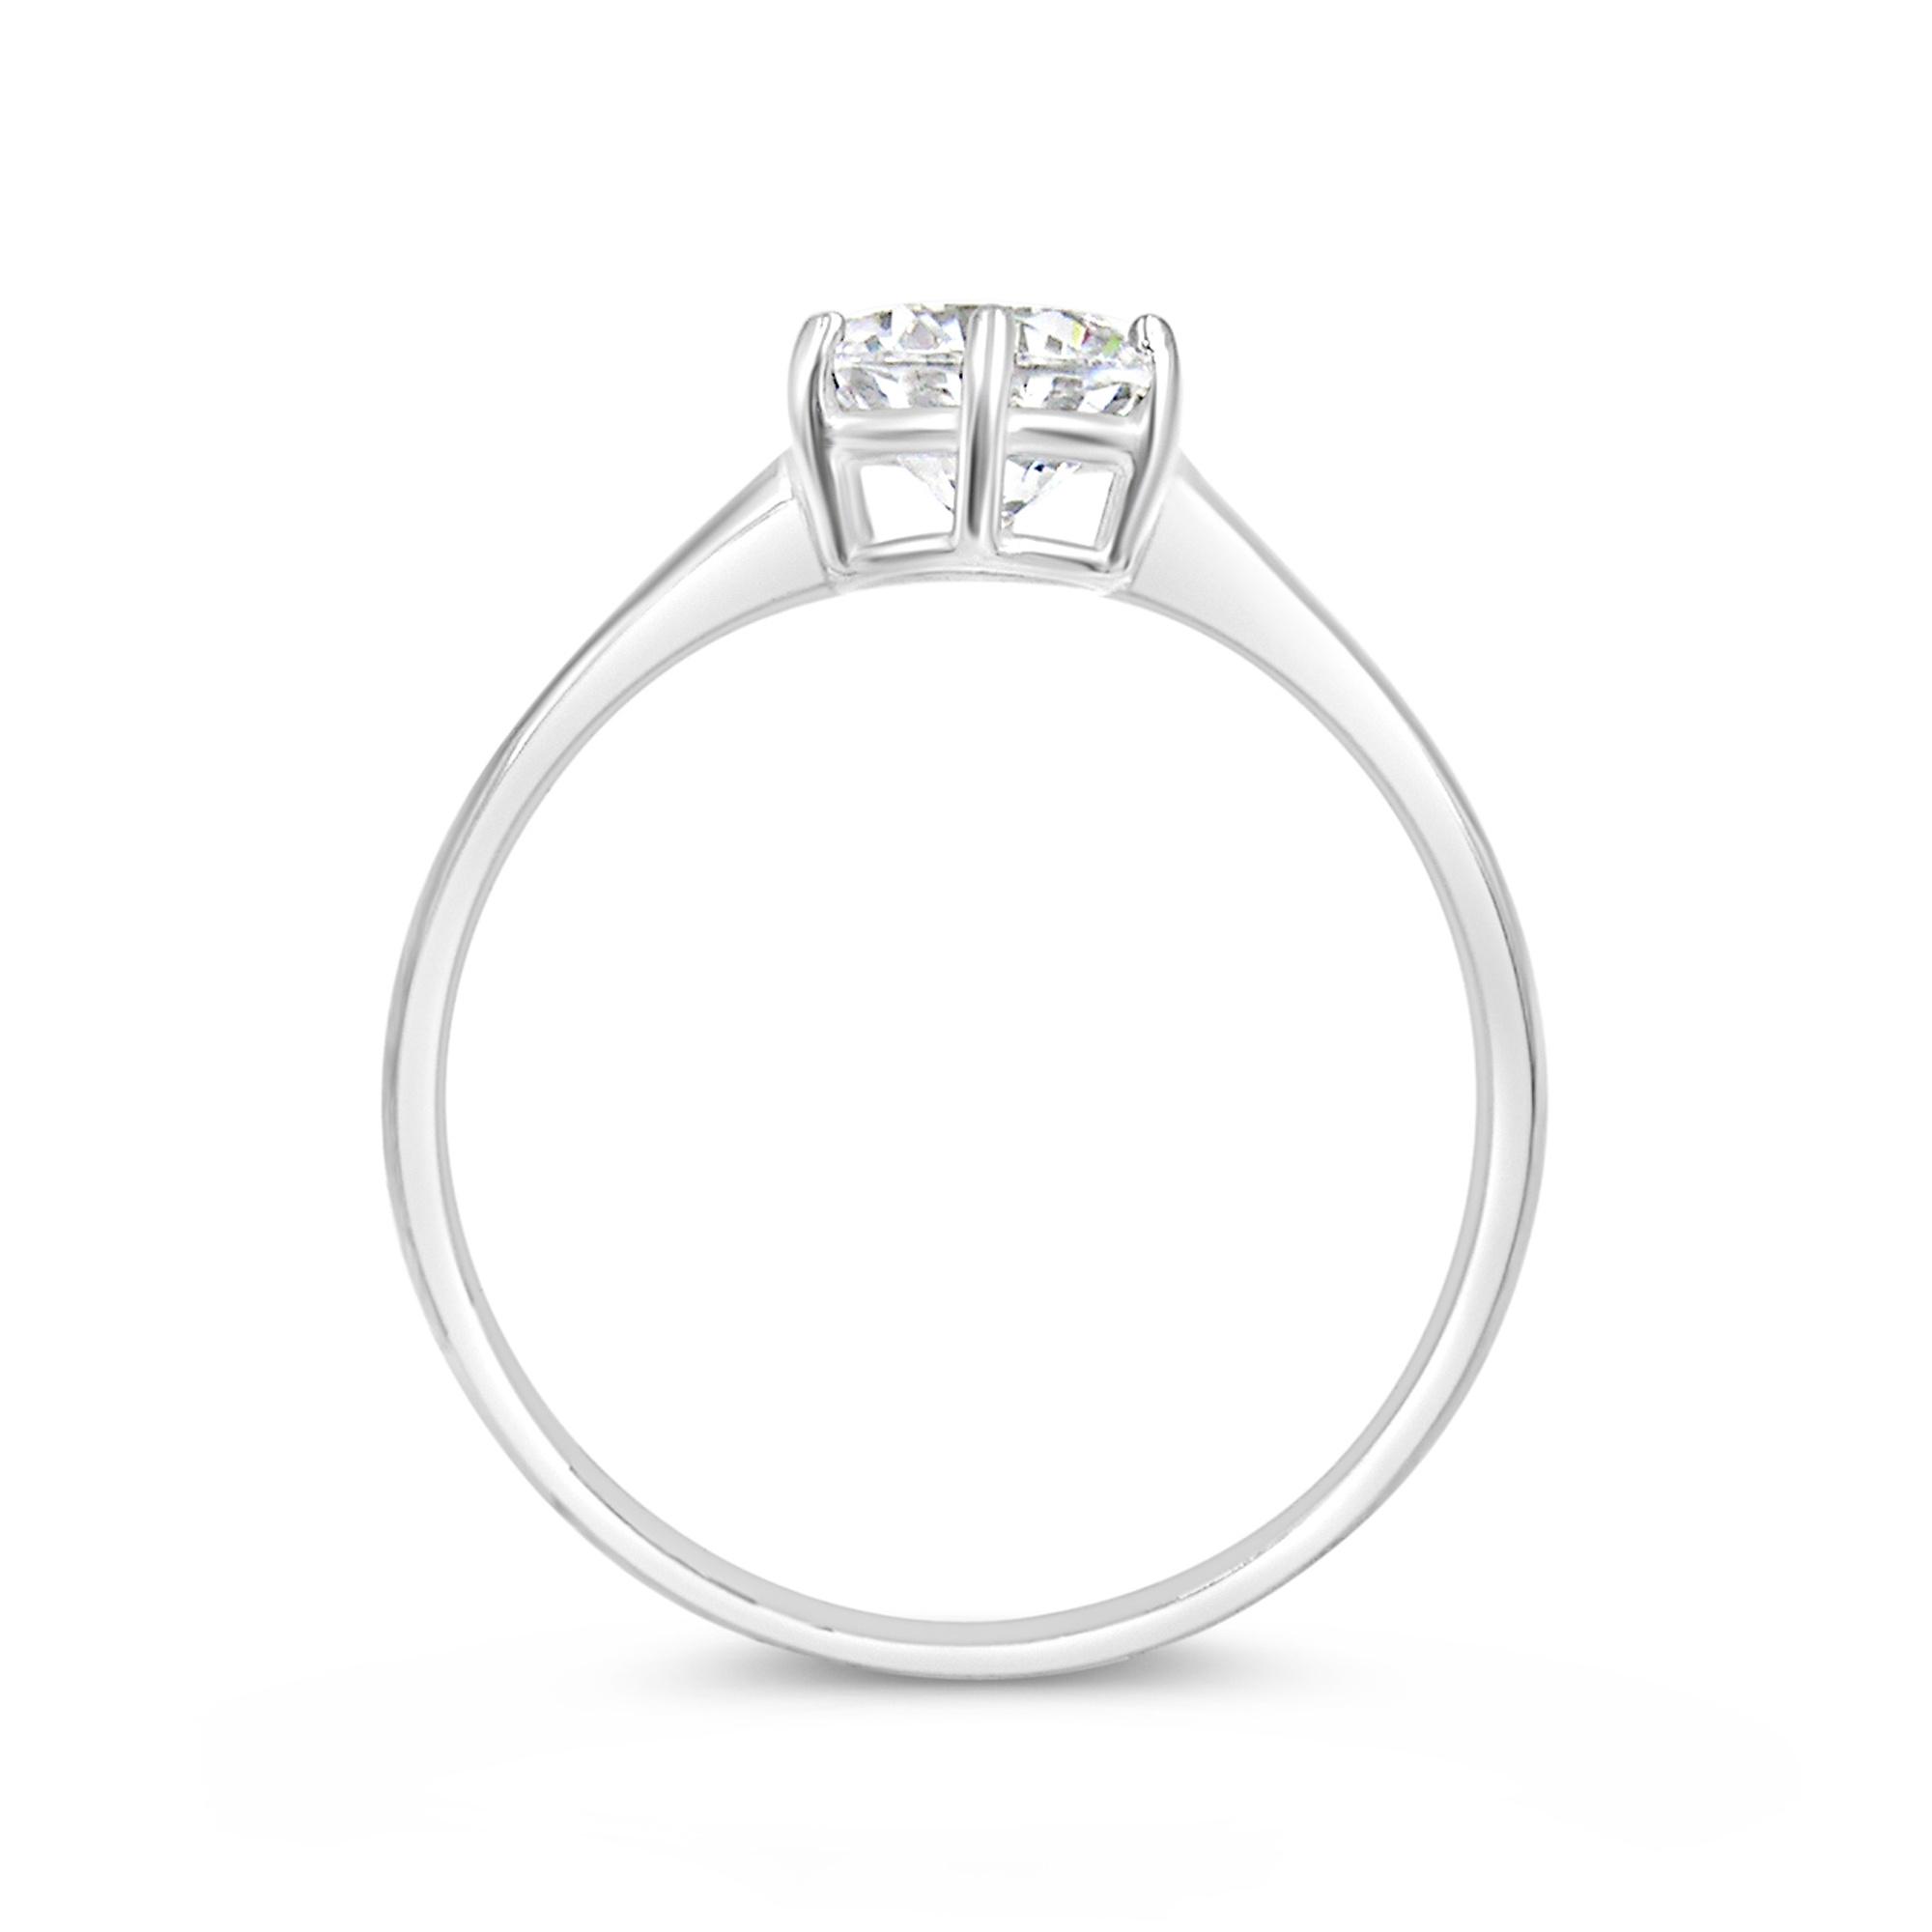 18kt wit goud verlovingsring met zirkonia